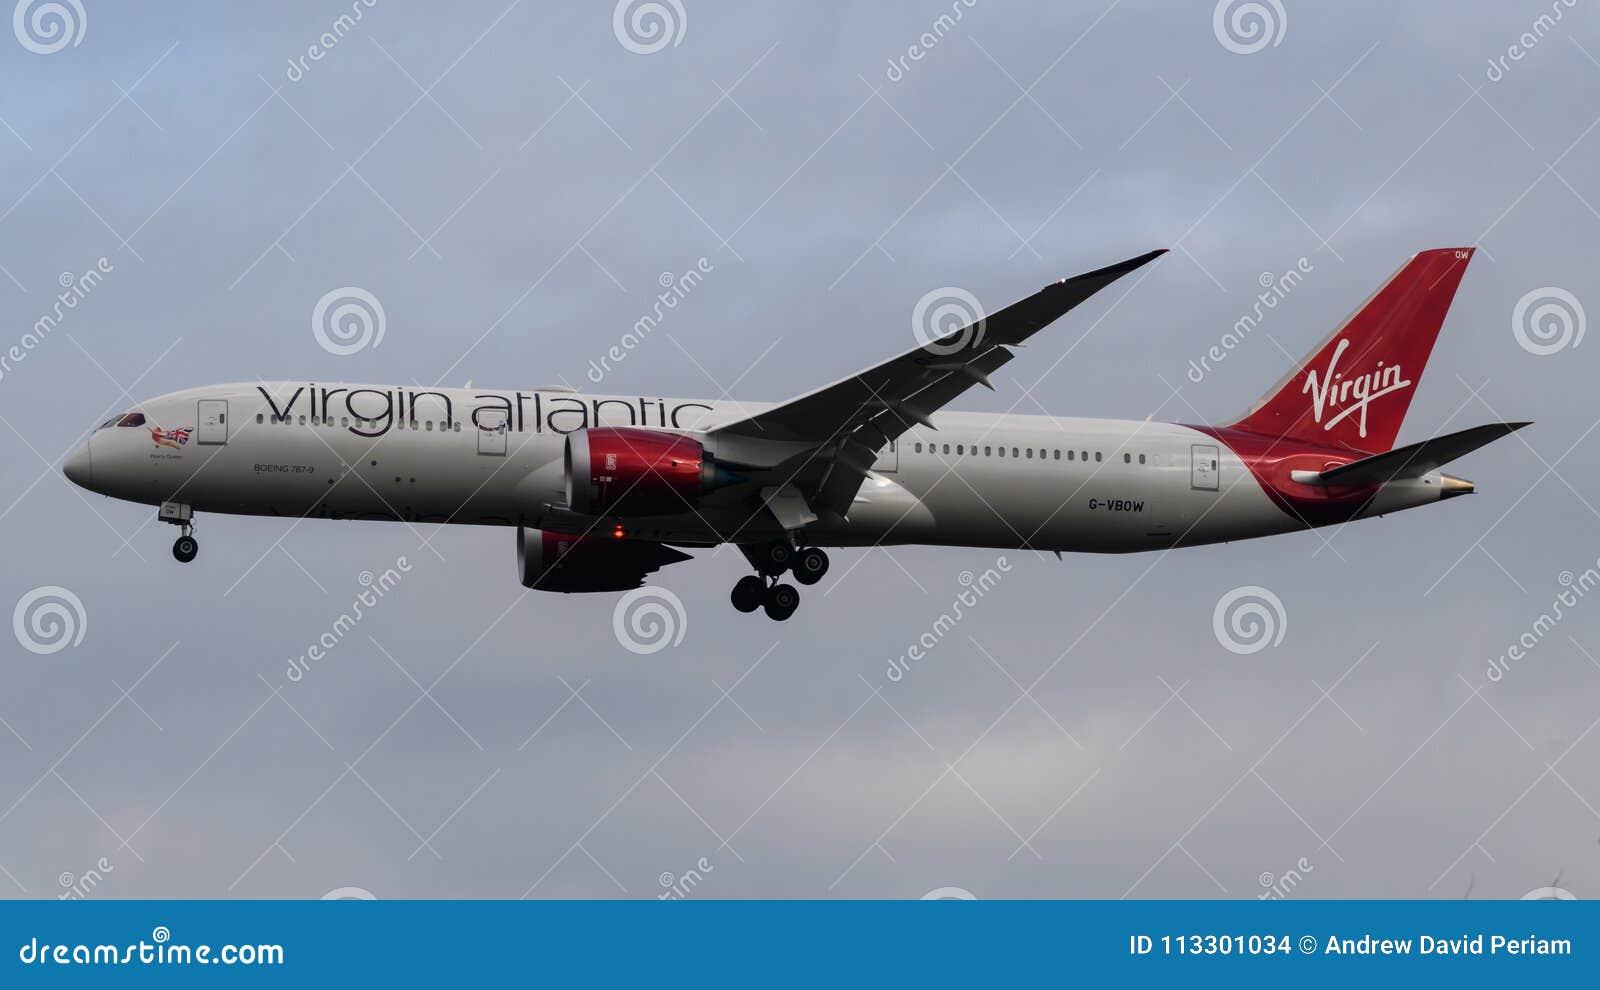 Virgin Atlantic Airlines Boeing 787 Dreamliner Arriving At